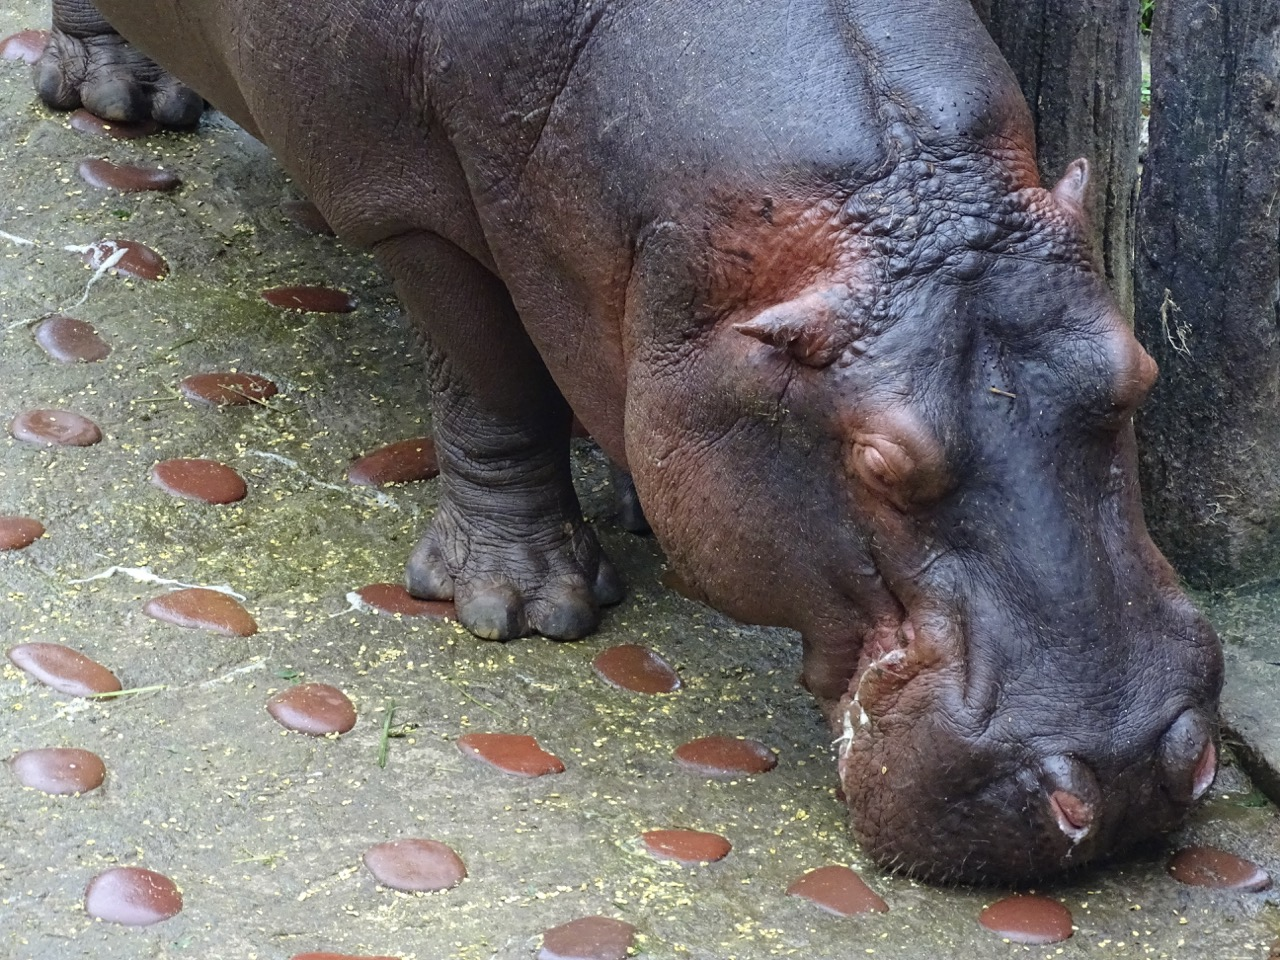 Hippo at Taipei Zoo